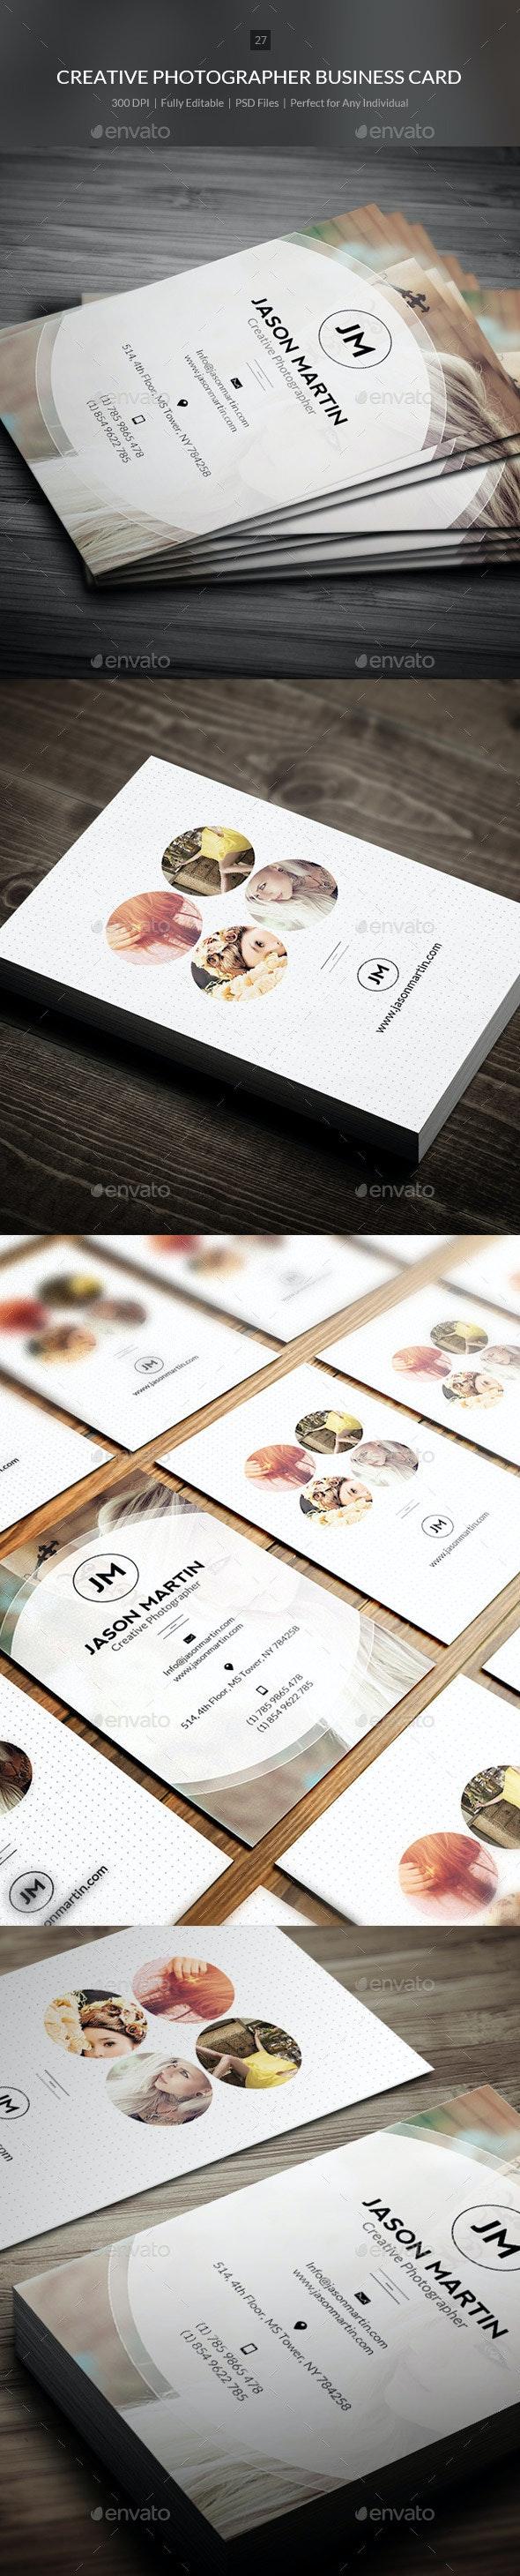 Creative Photogrpaher Business Card - 27 - Creative Business Cards